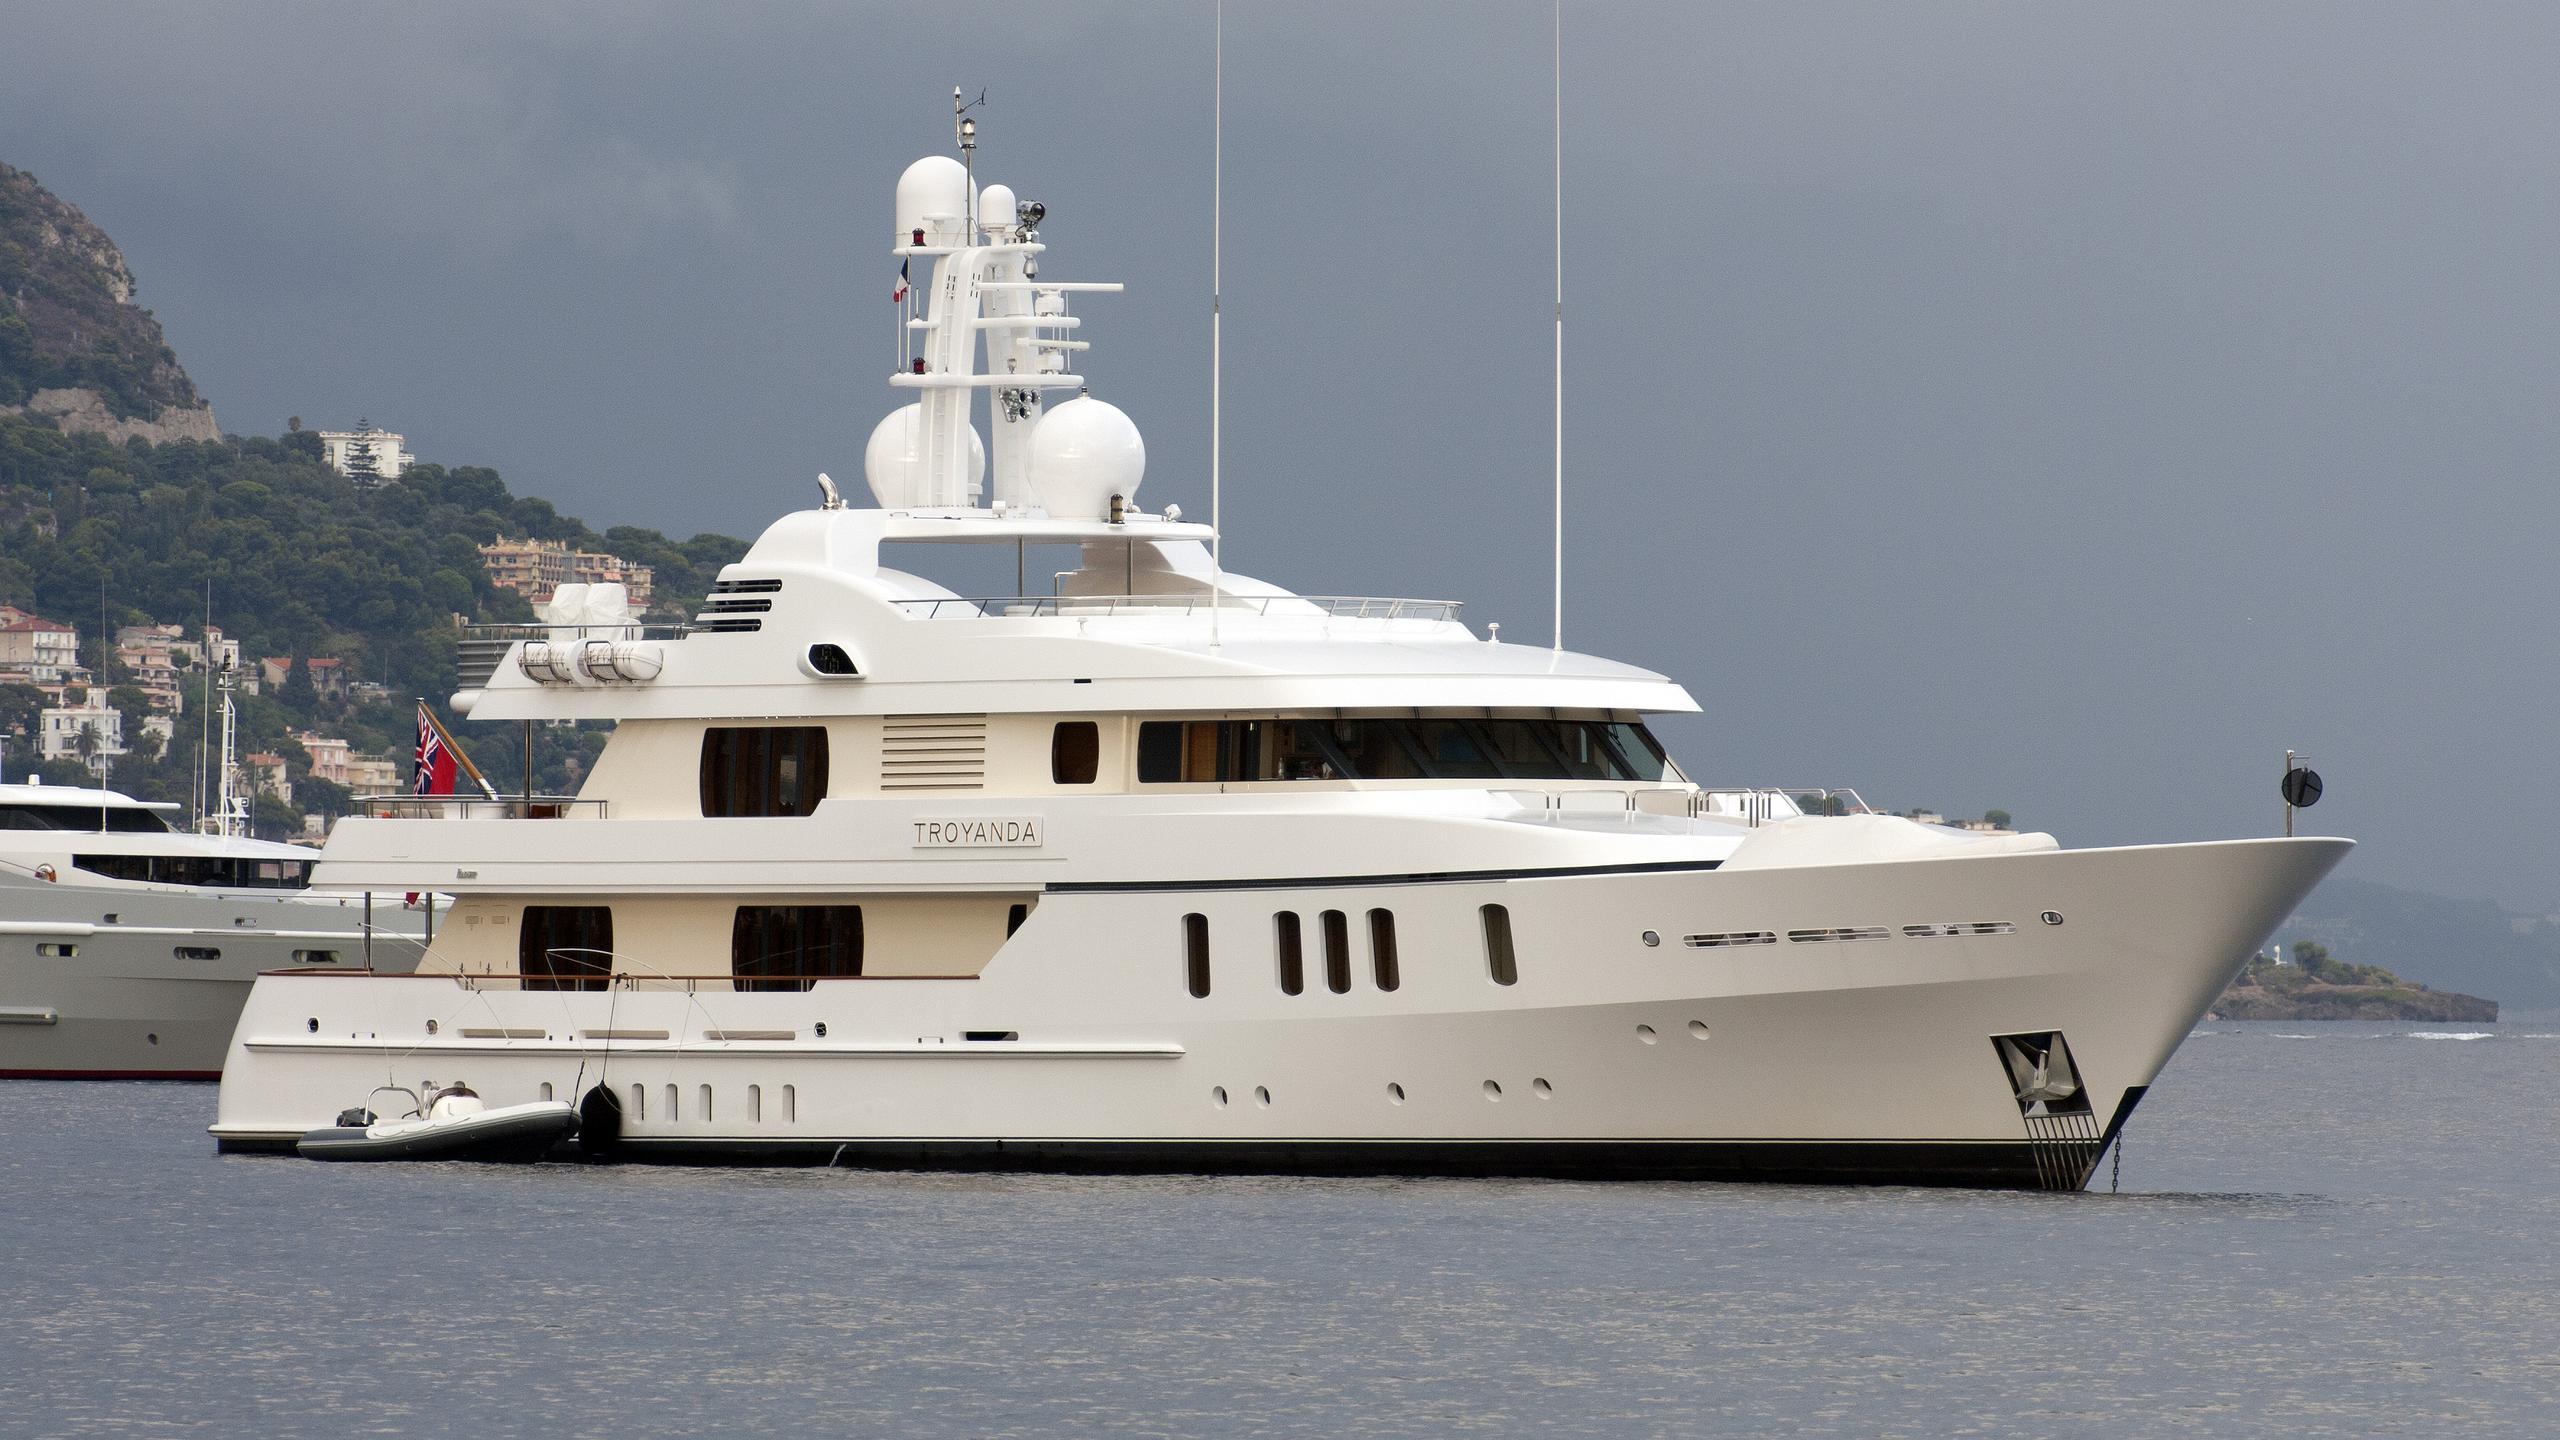 hanikon-troyanda-motor-yacht-feadship-2004-50m-moored